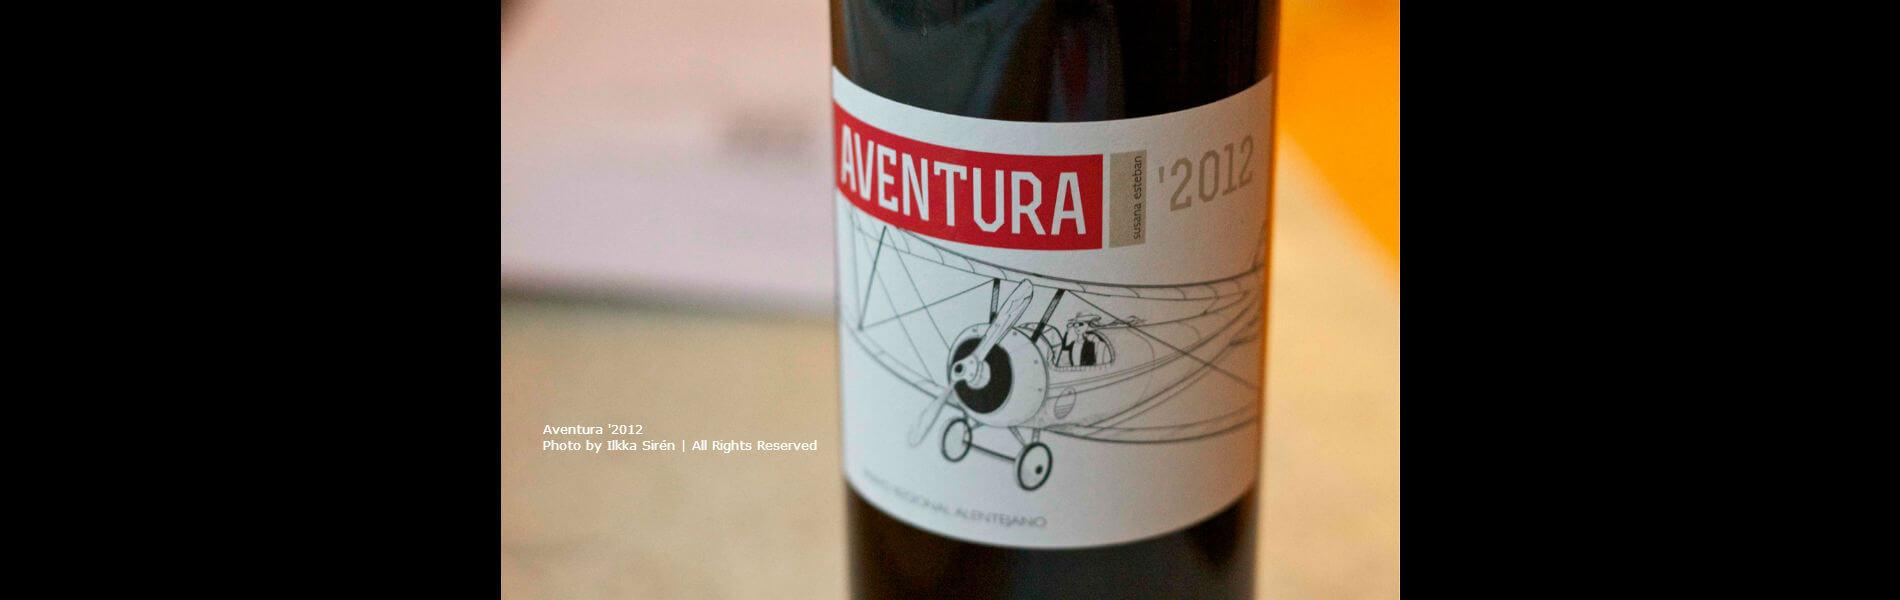 Blend-All-About-Wine-Aventura-2012-Slider